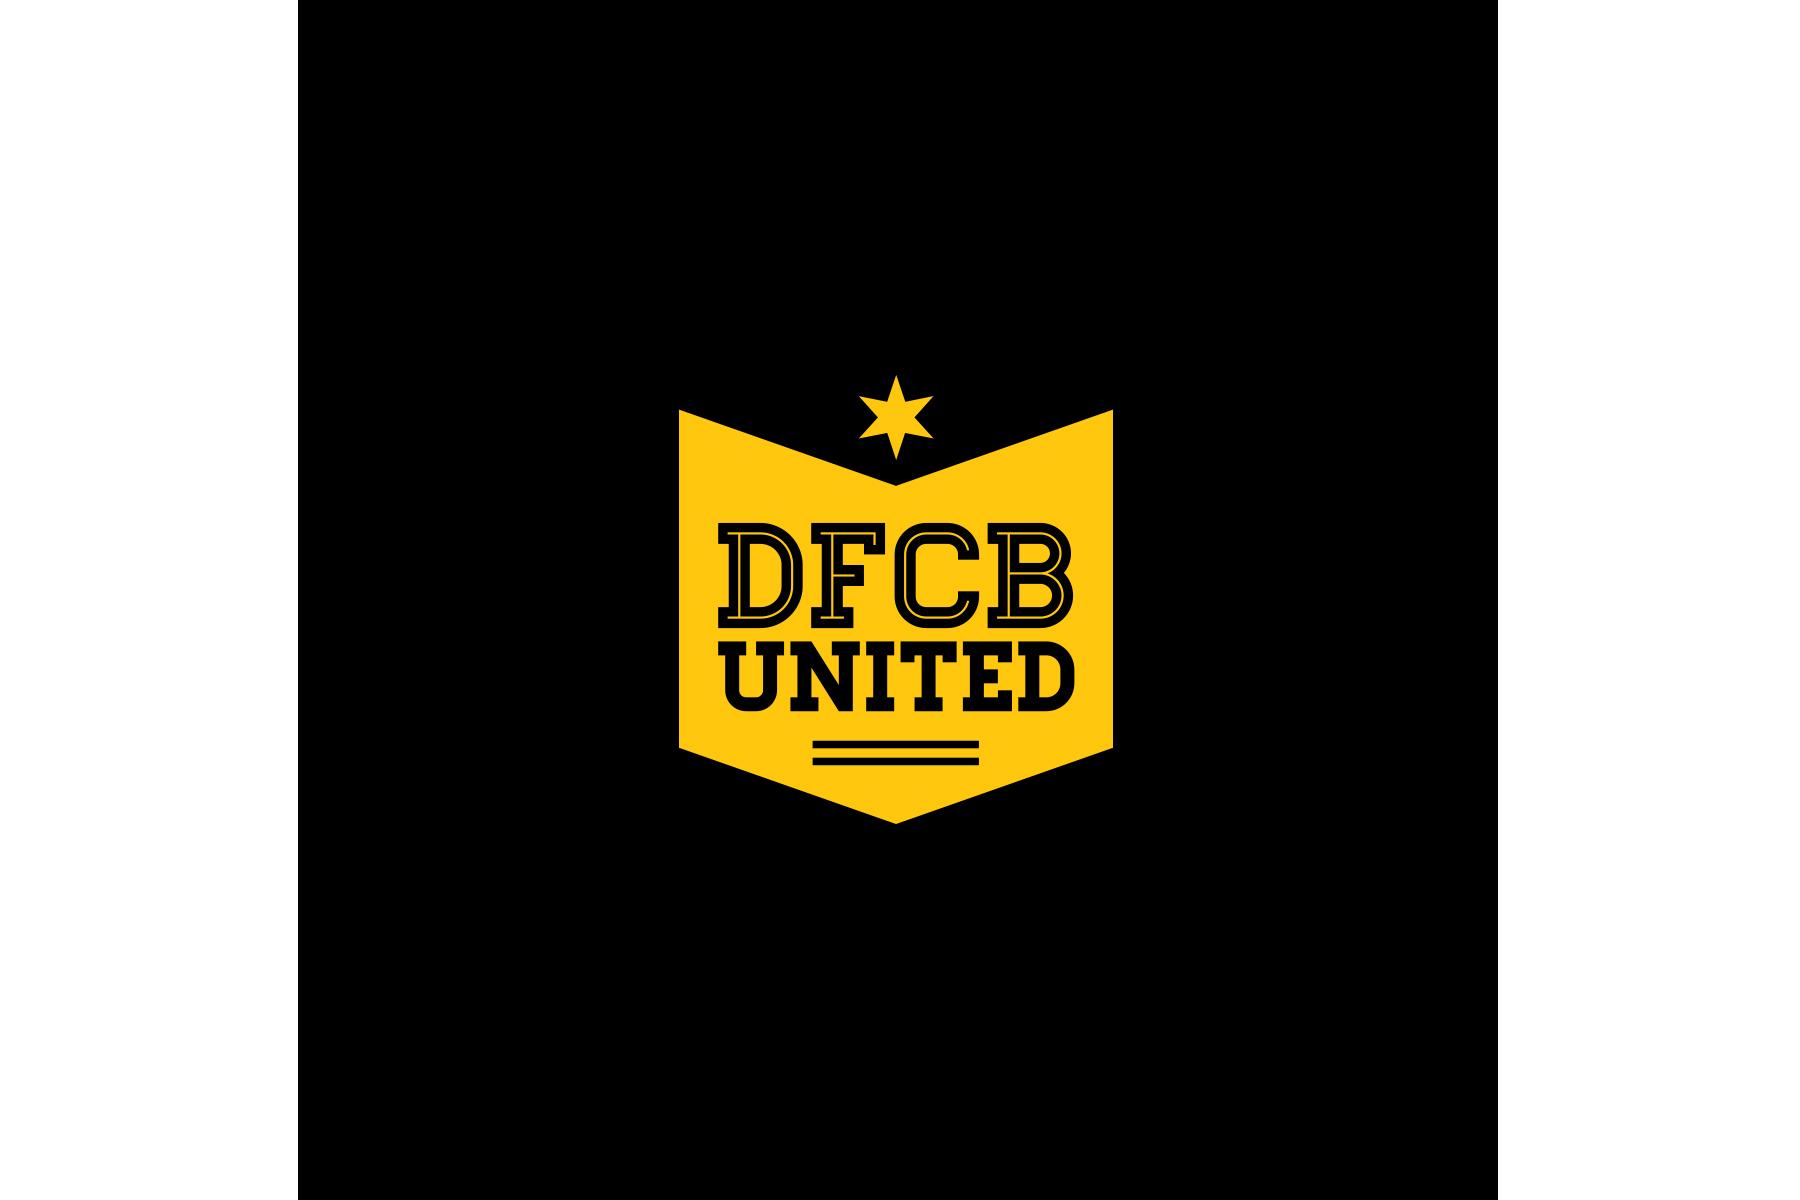 Logos_6x4_ColorBlock_DFCB.jpg